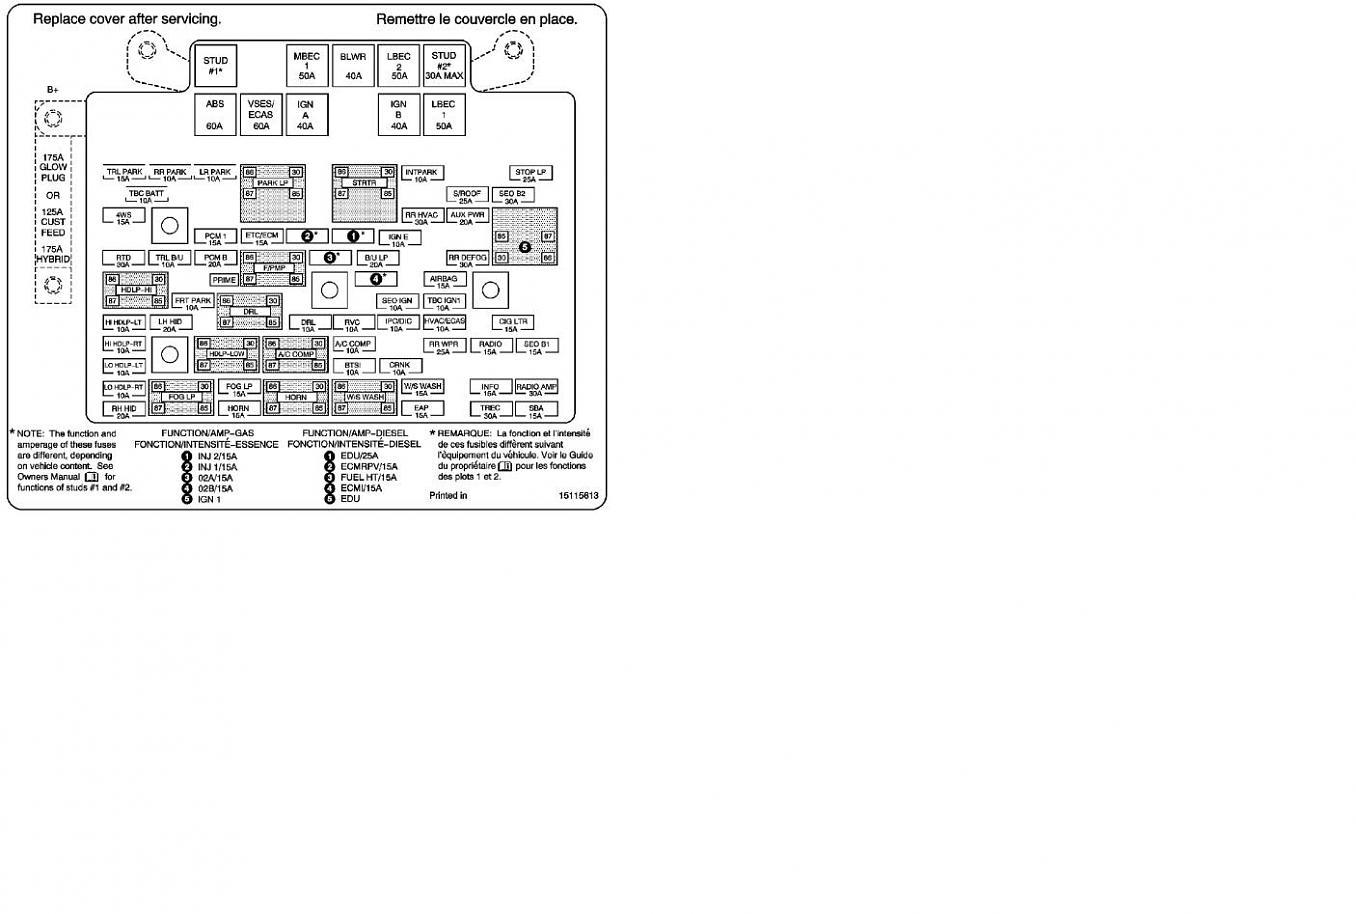 [DIAGRAM_38IS]  VS_9014] 1997 Freightliner Wiring Diagram | 1996 Fl80 Freightliner Fuse Box Diagram |  | Pical Ponge Wigeg Mohammedshrine Librar Wiring 101